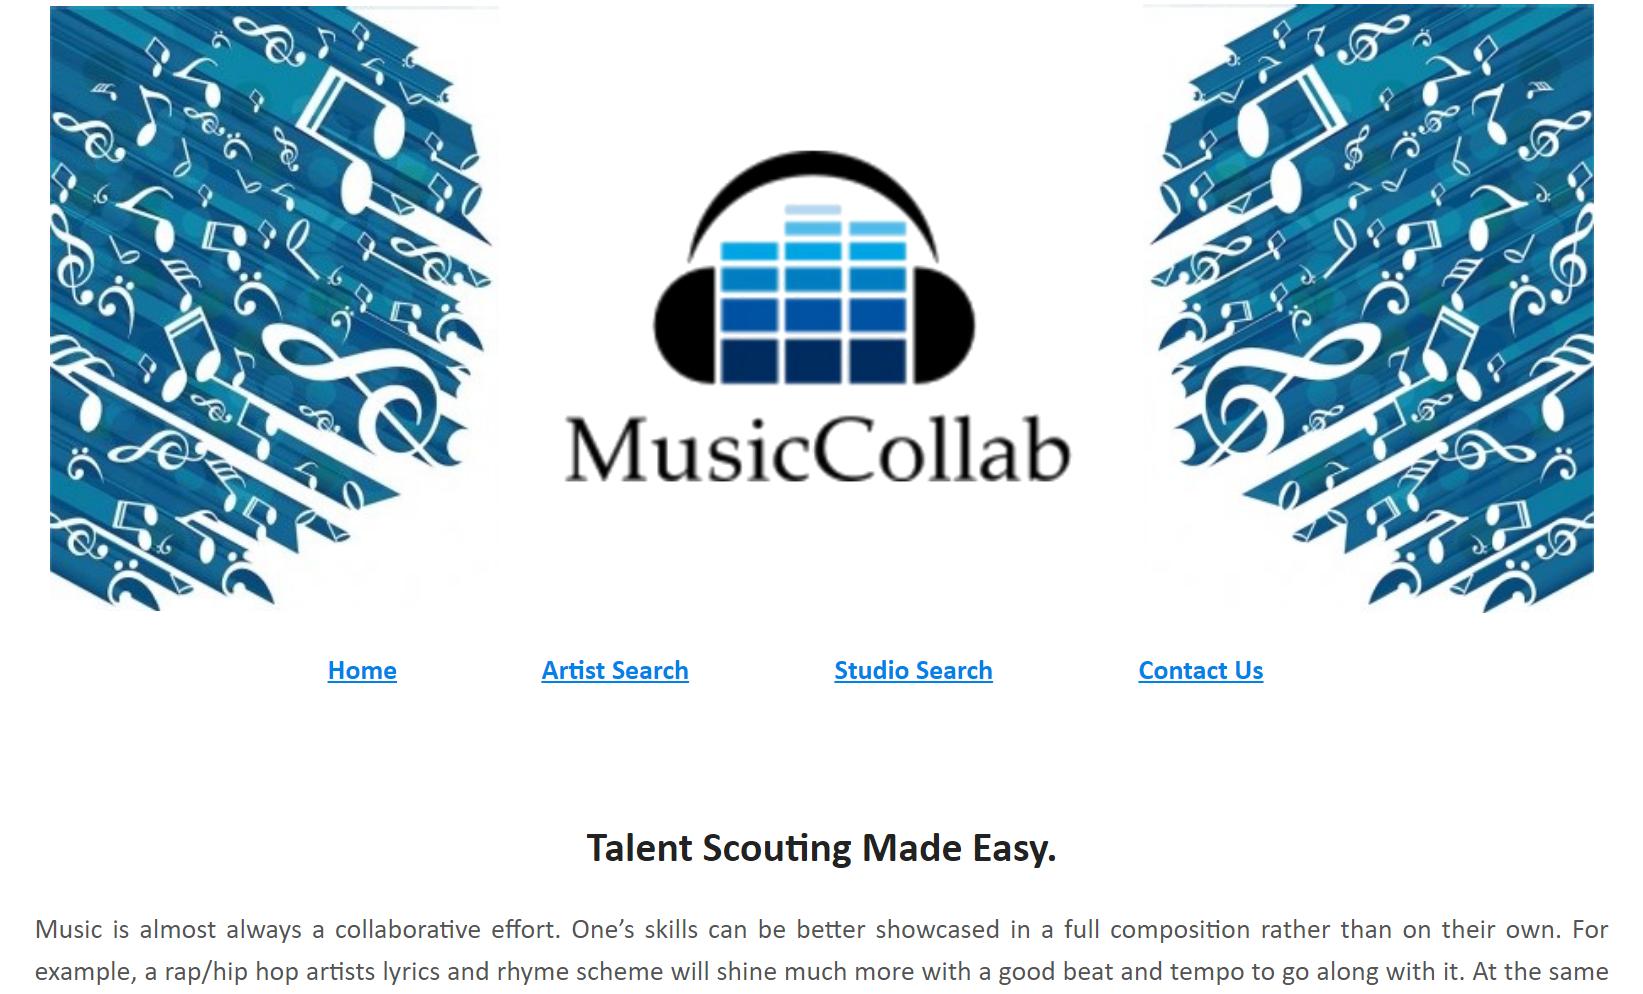 Adventures in Entrepreneurship: MusicCollab